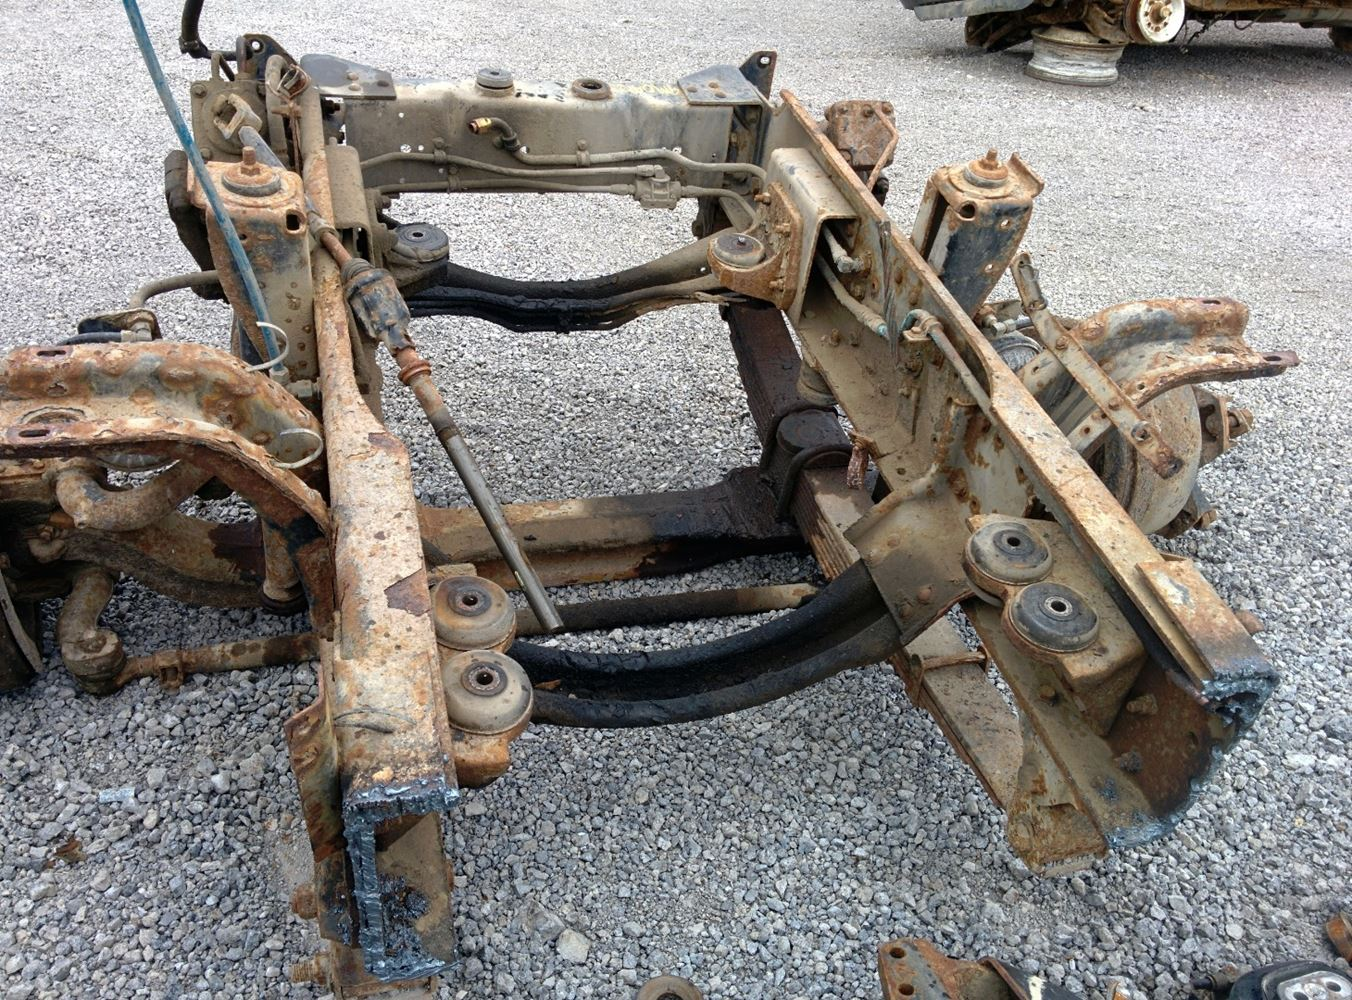 https://images.truckpartsinventory.com/p/24227/1995-GMC-TOPKICK-Front-Axles--Complete-j0WjERJn5oRe_f.jpg